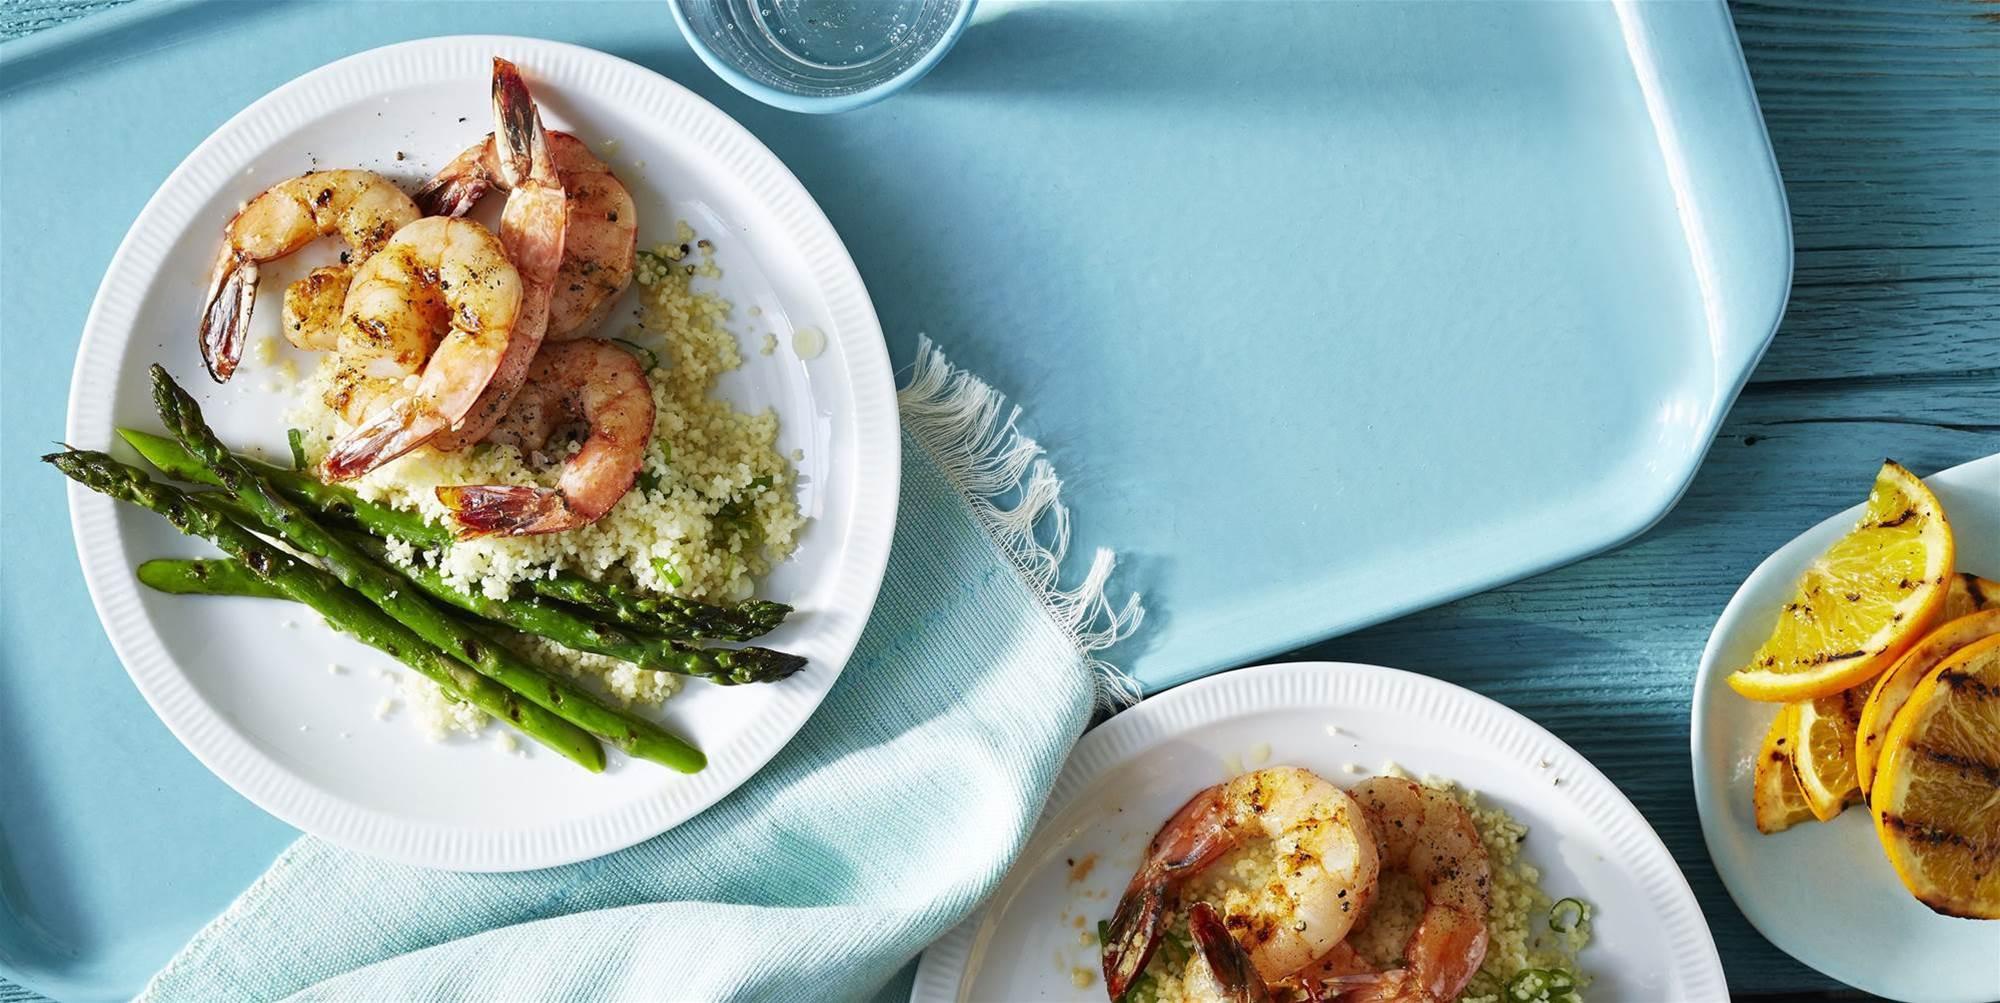 Cumin Grilled Prawn and Asparagus Recipe